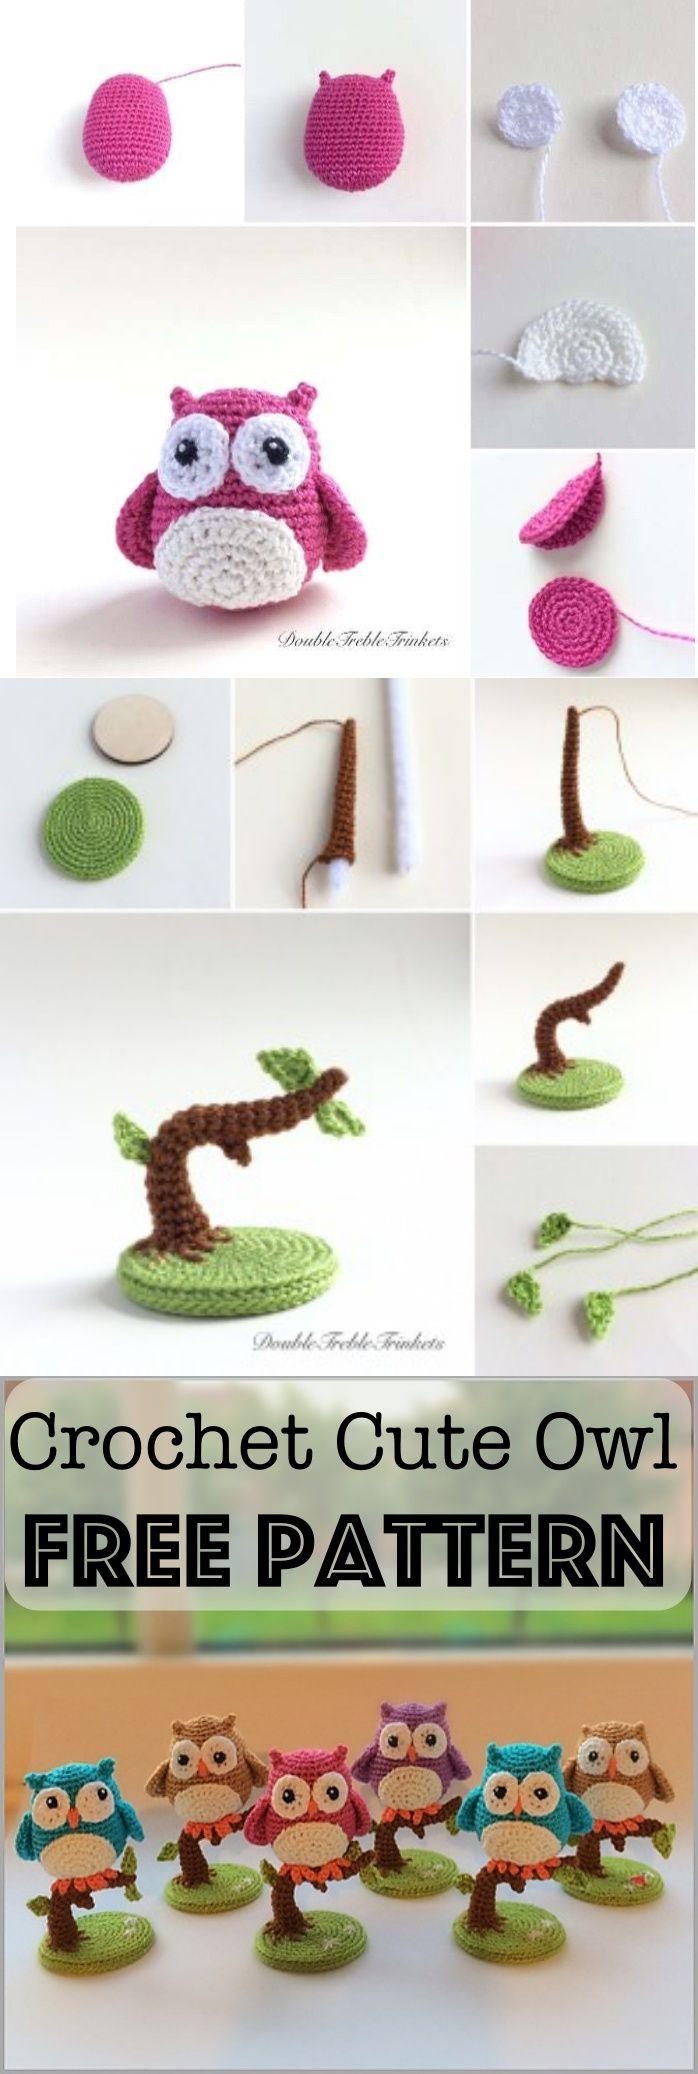 Crochet Cute Little Owls with Free Pattern | Las modelos, Pequeños y ...